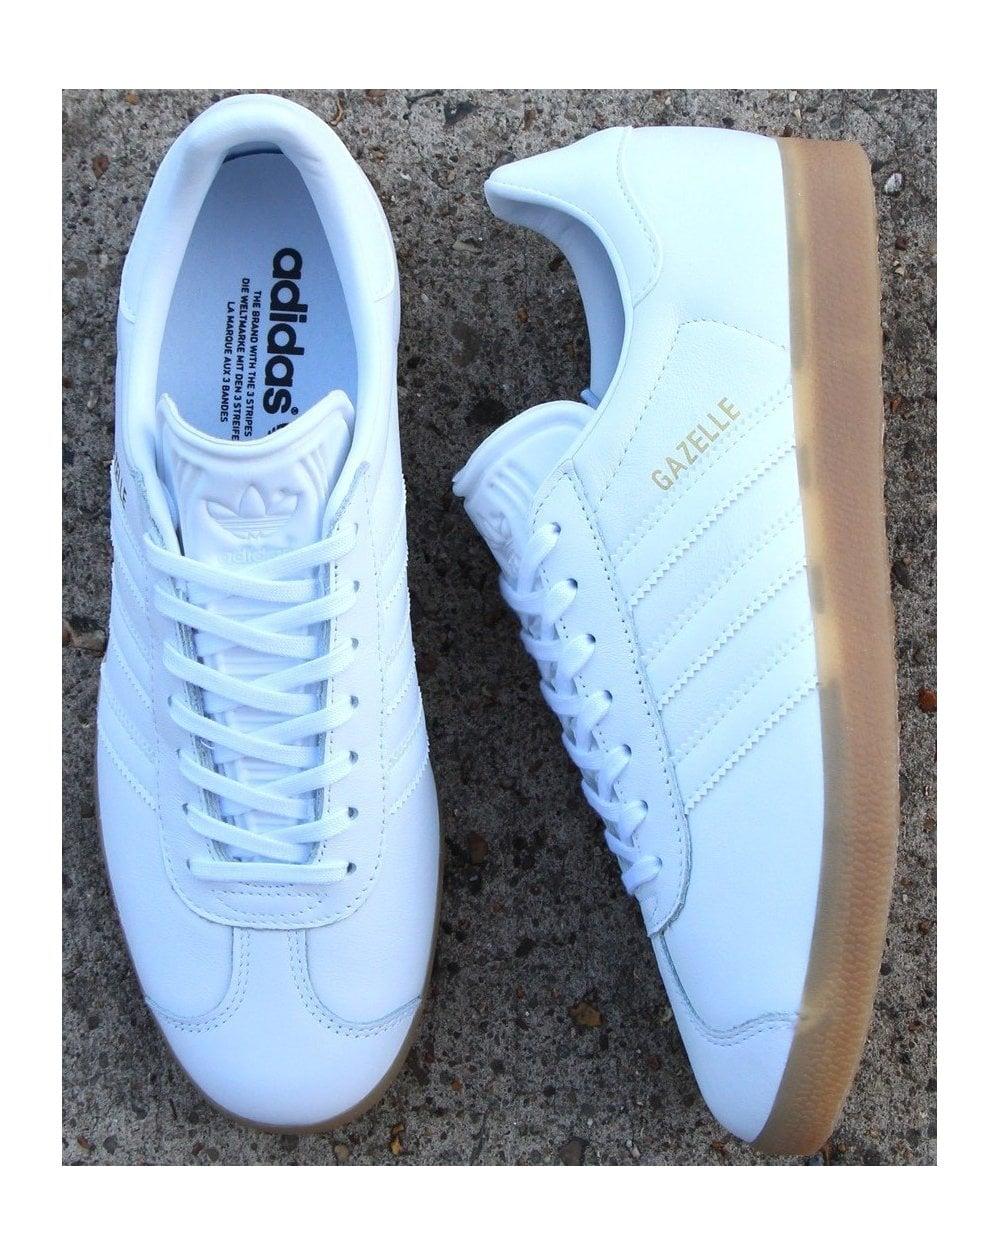 Adidas Gazelle Trainers, White, Leather